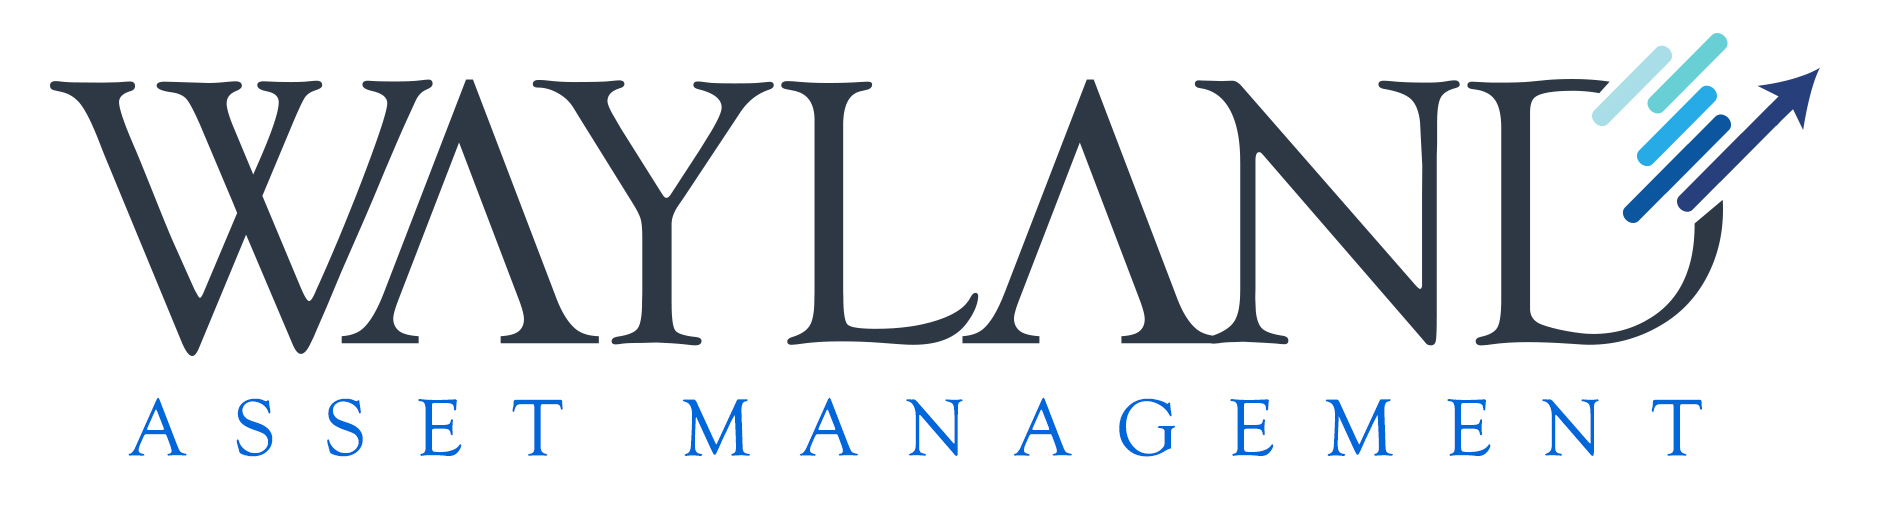 Wayland Asset Management announces the implementation of new client induction program.